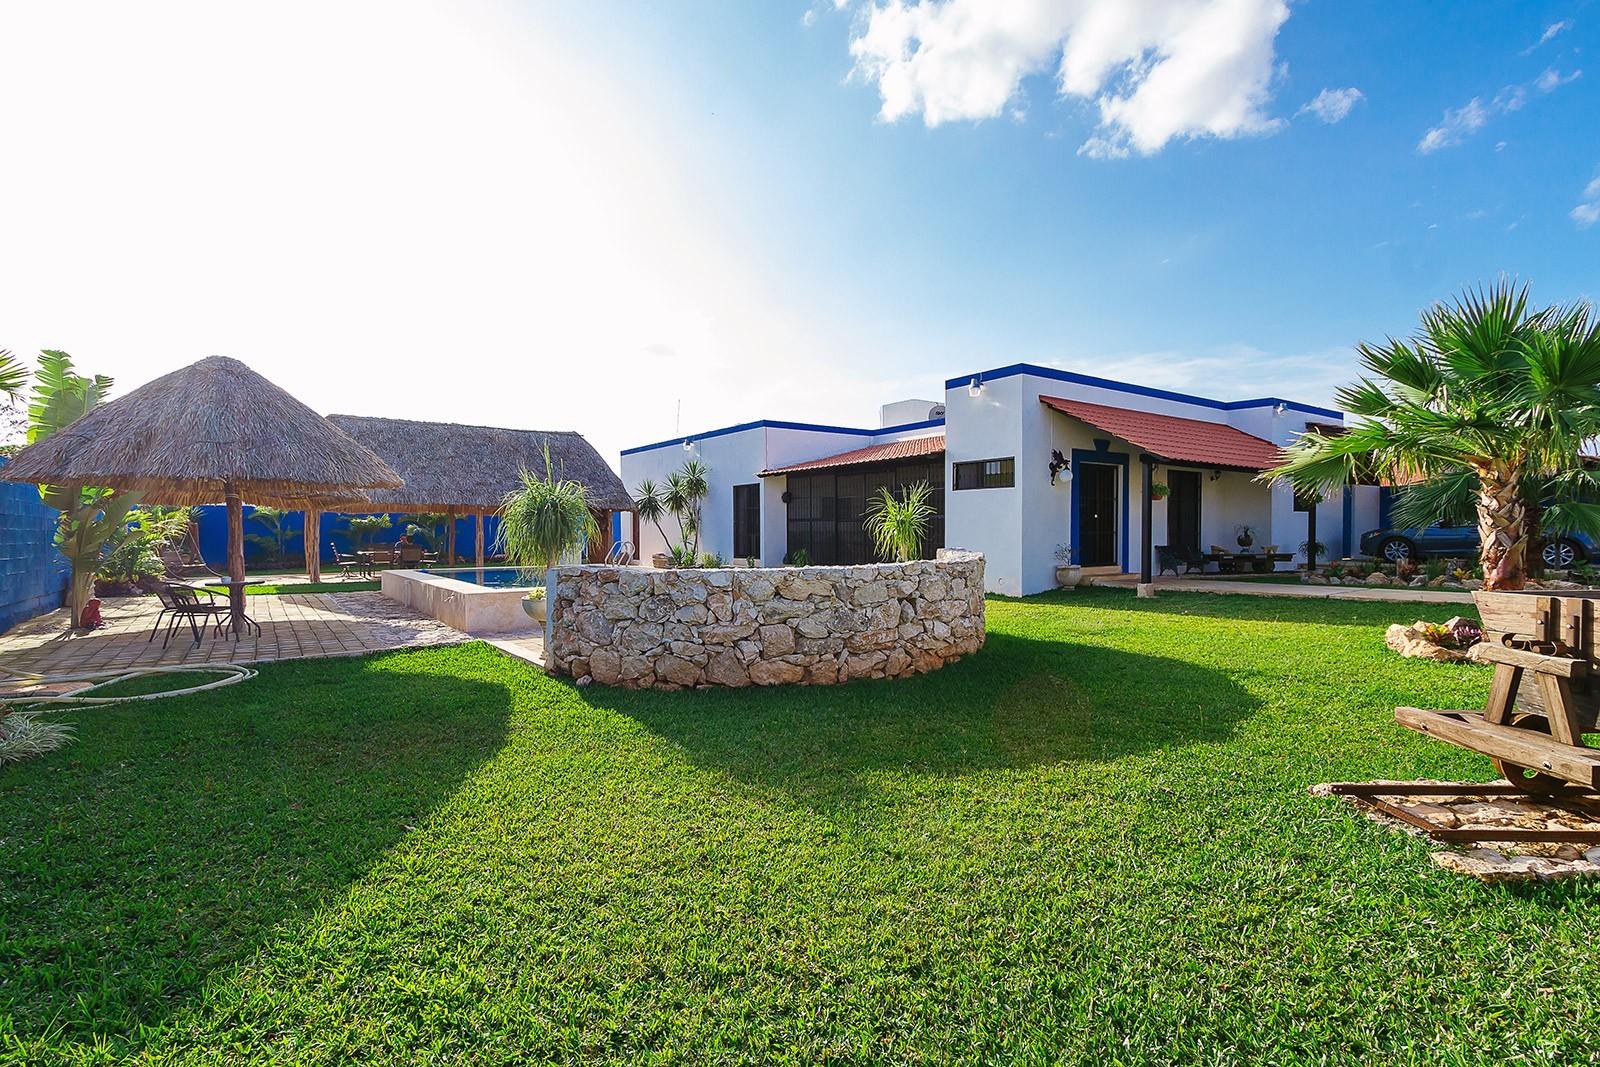 Casas en m rida casa b residencial baspul for Modelo de casa quinta en paraguay